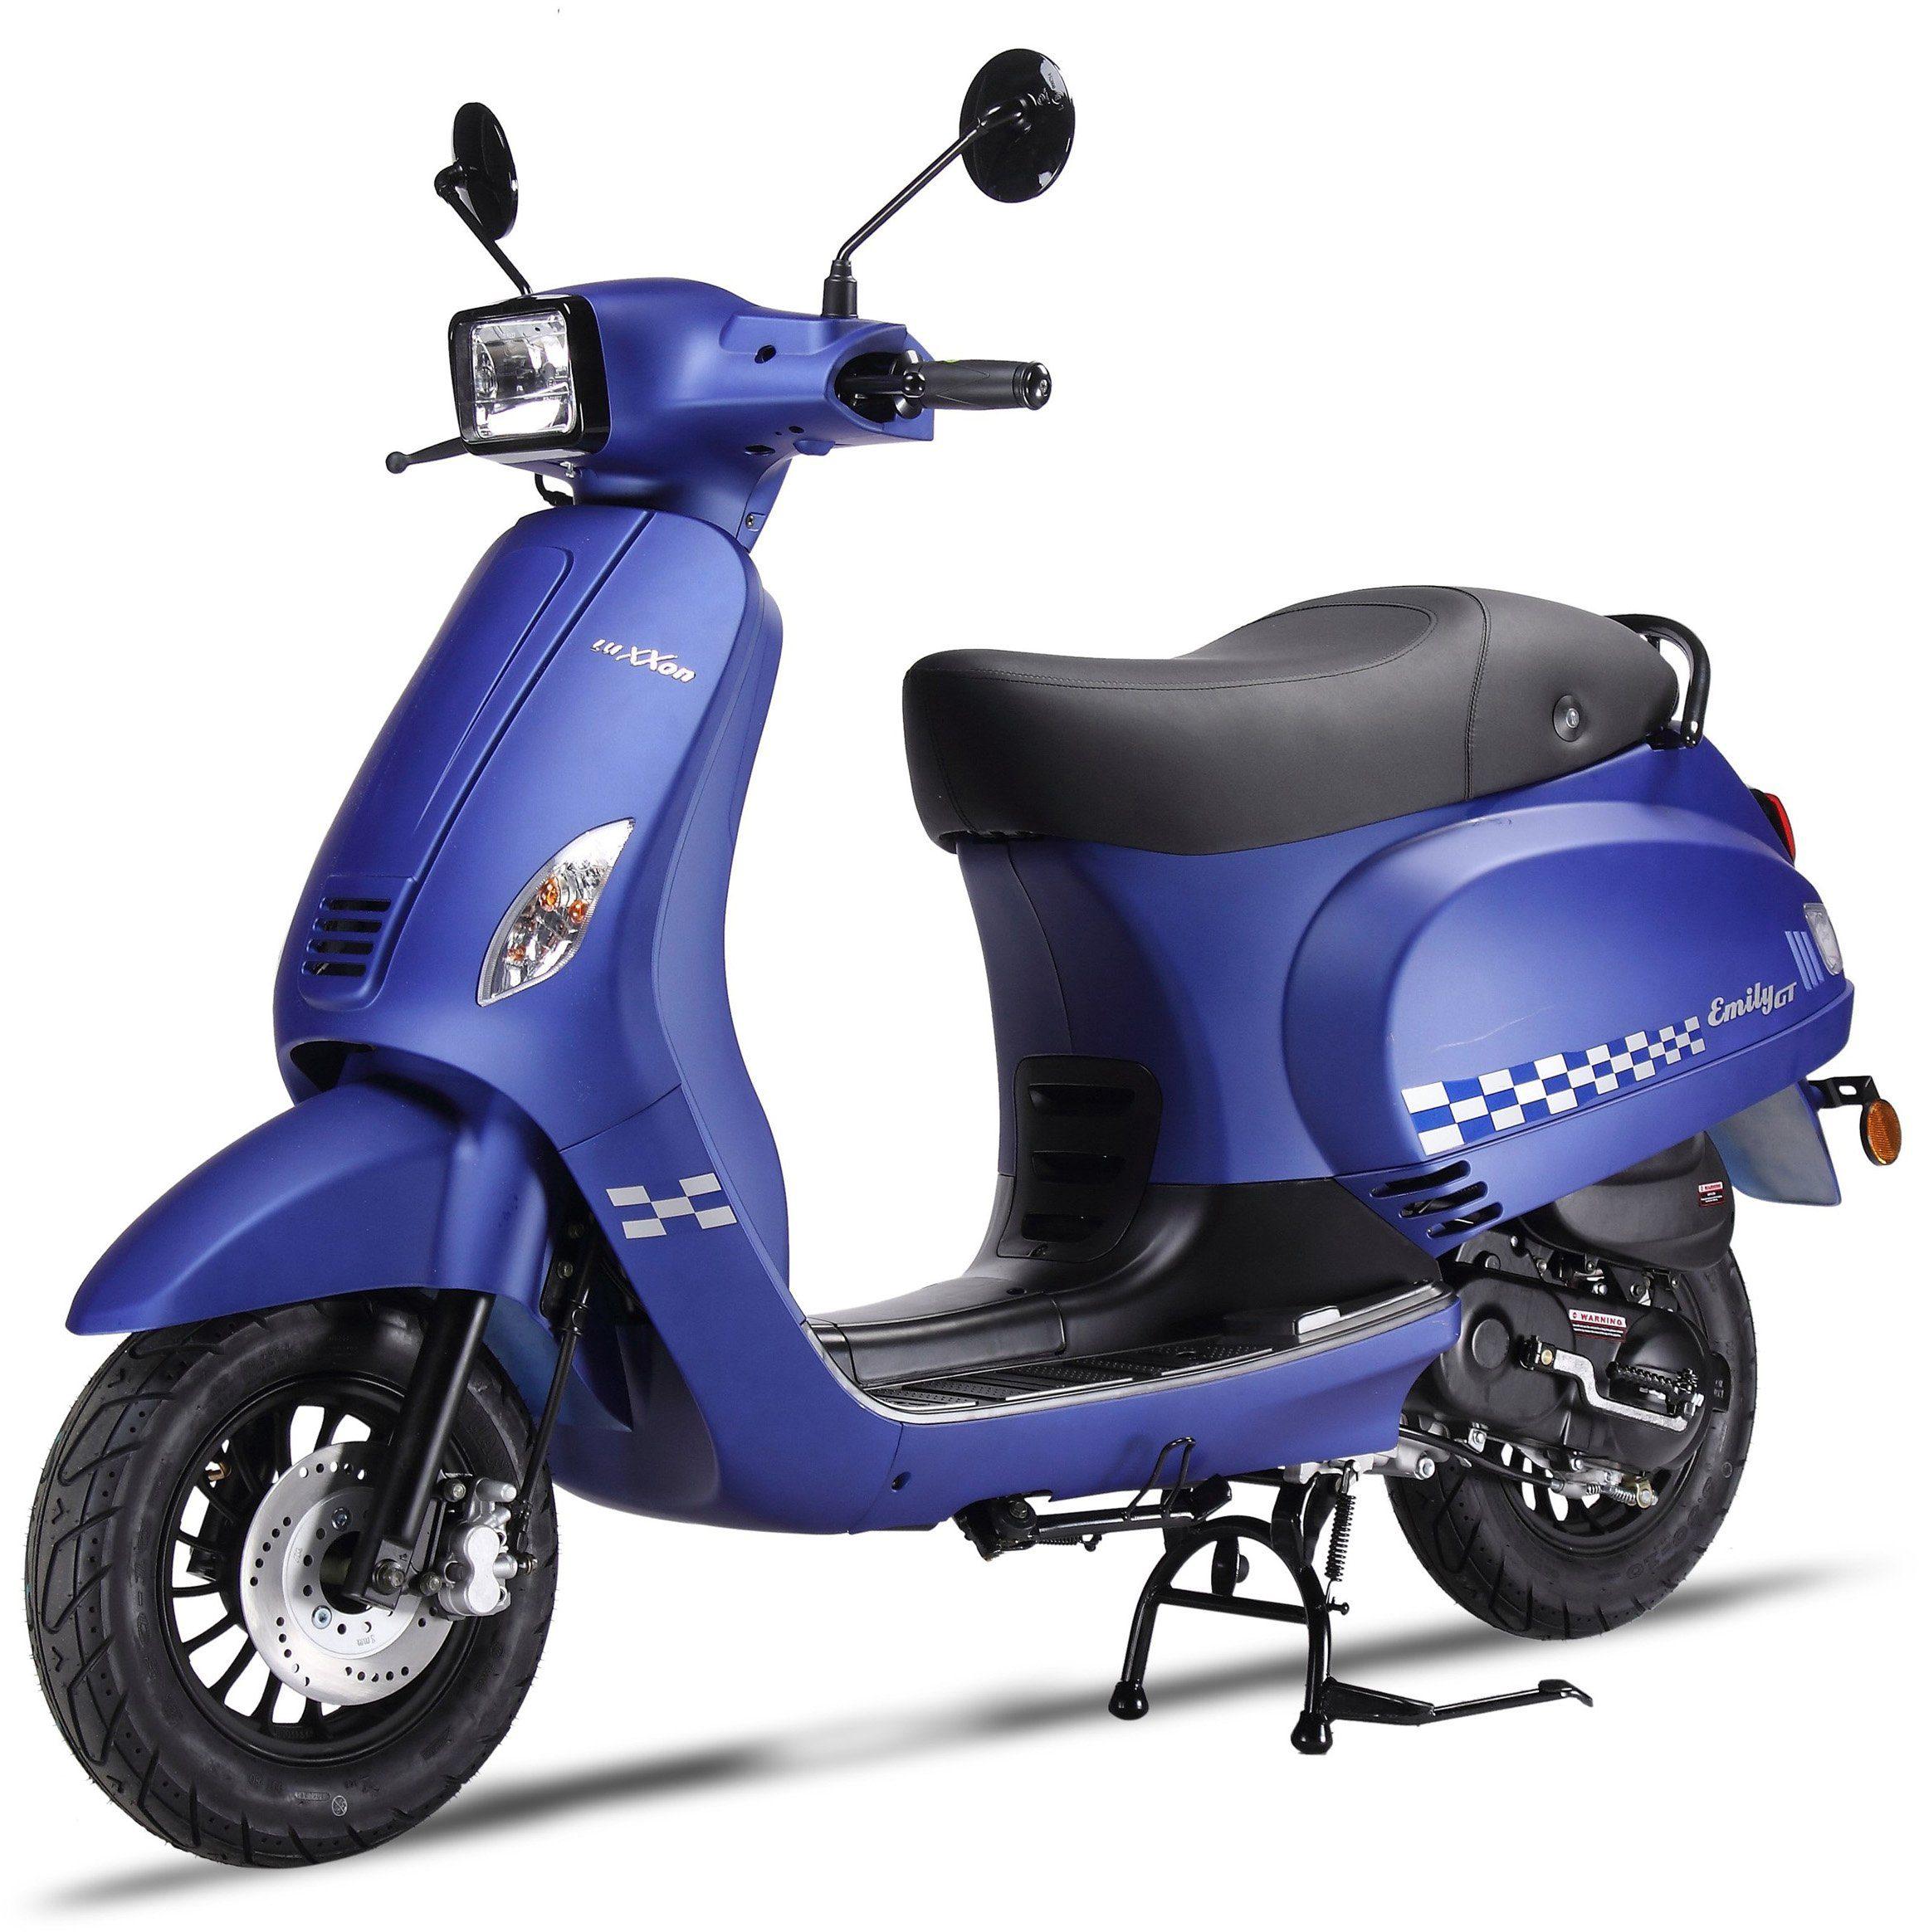 Luxxon Mofaroller »Emily GT«, 50 ccm, 25 km/h, Euro 2, 49 ccm, 25 km/h